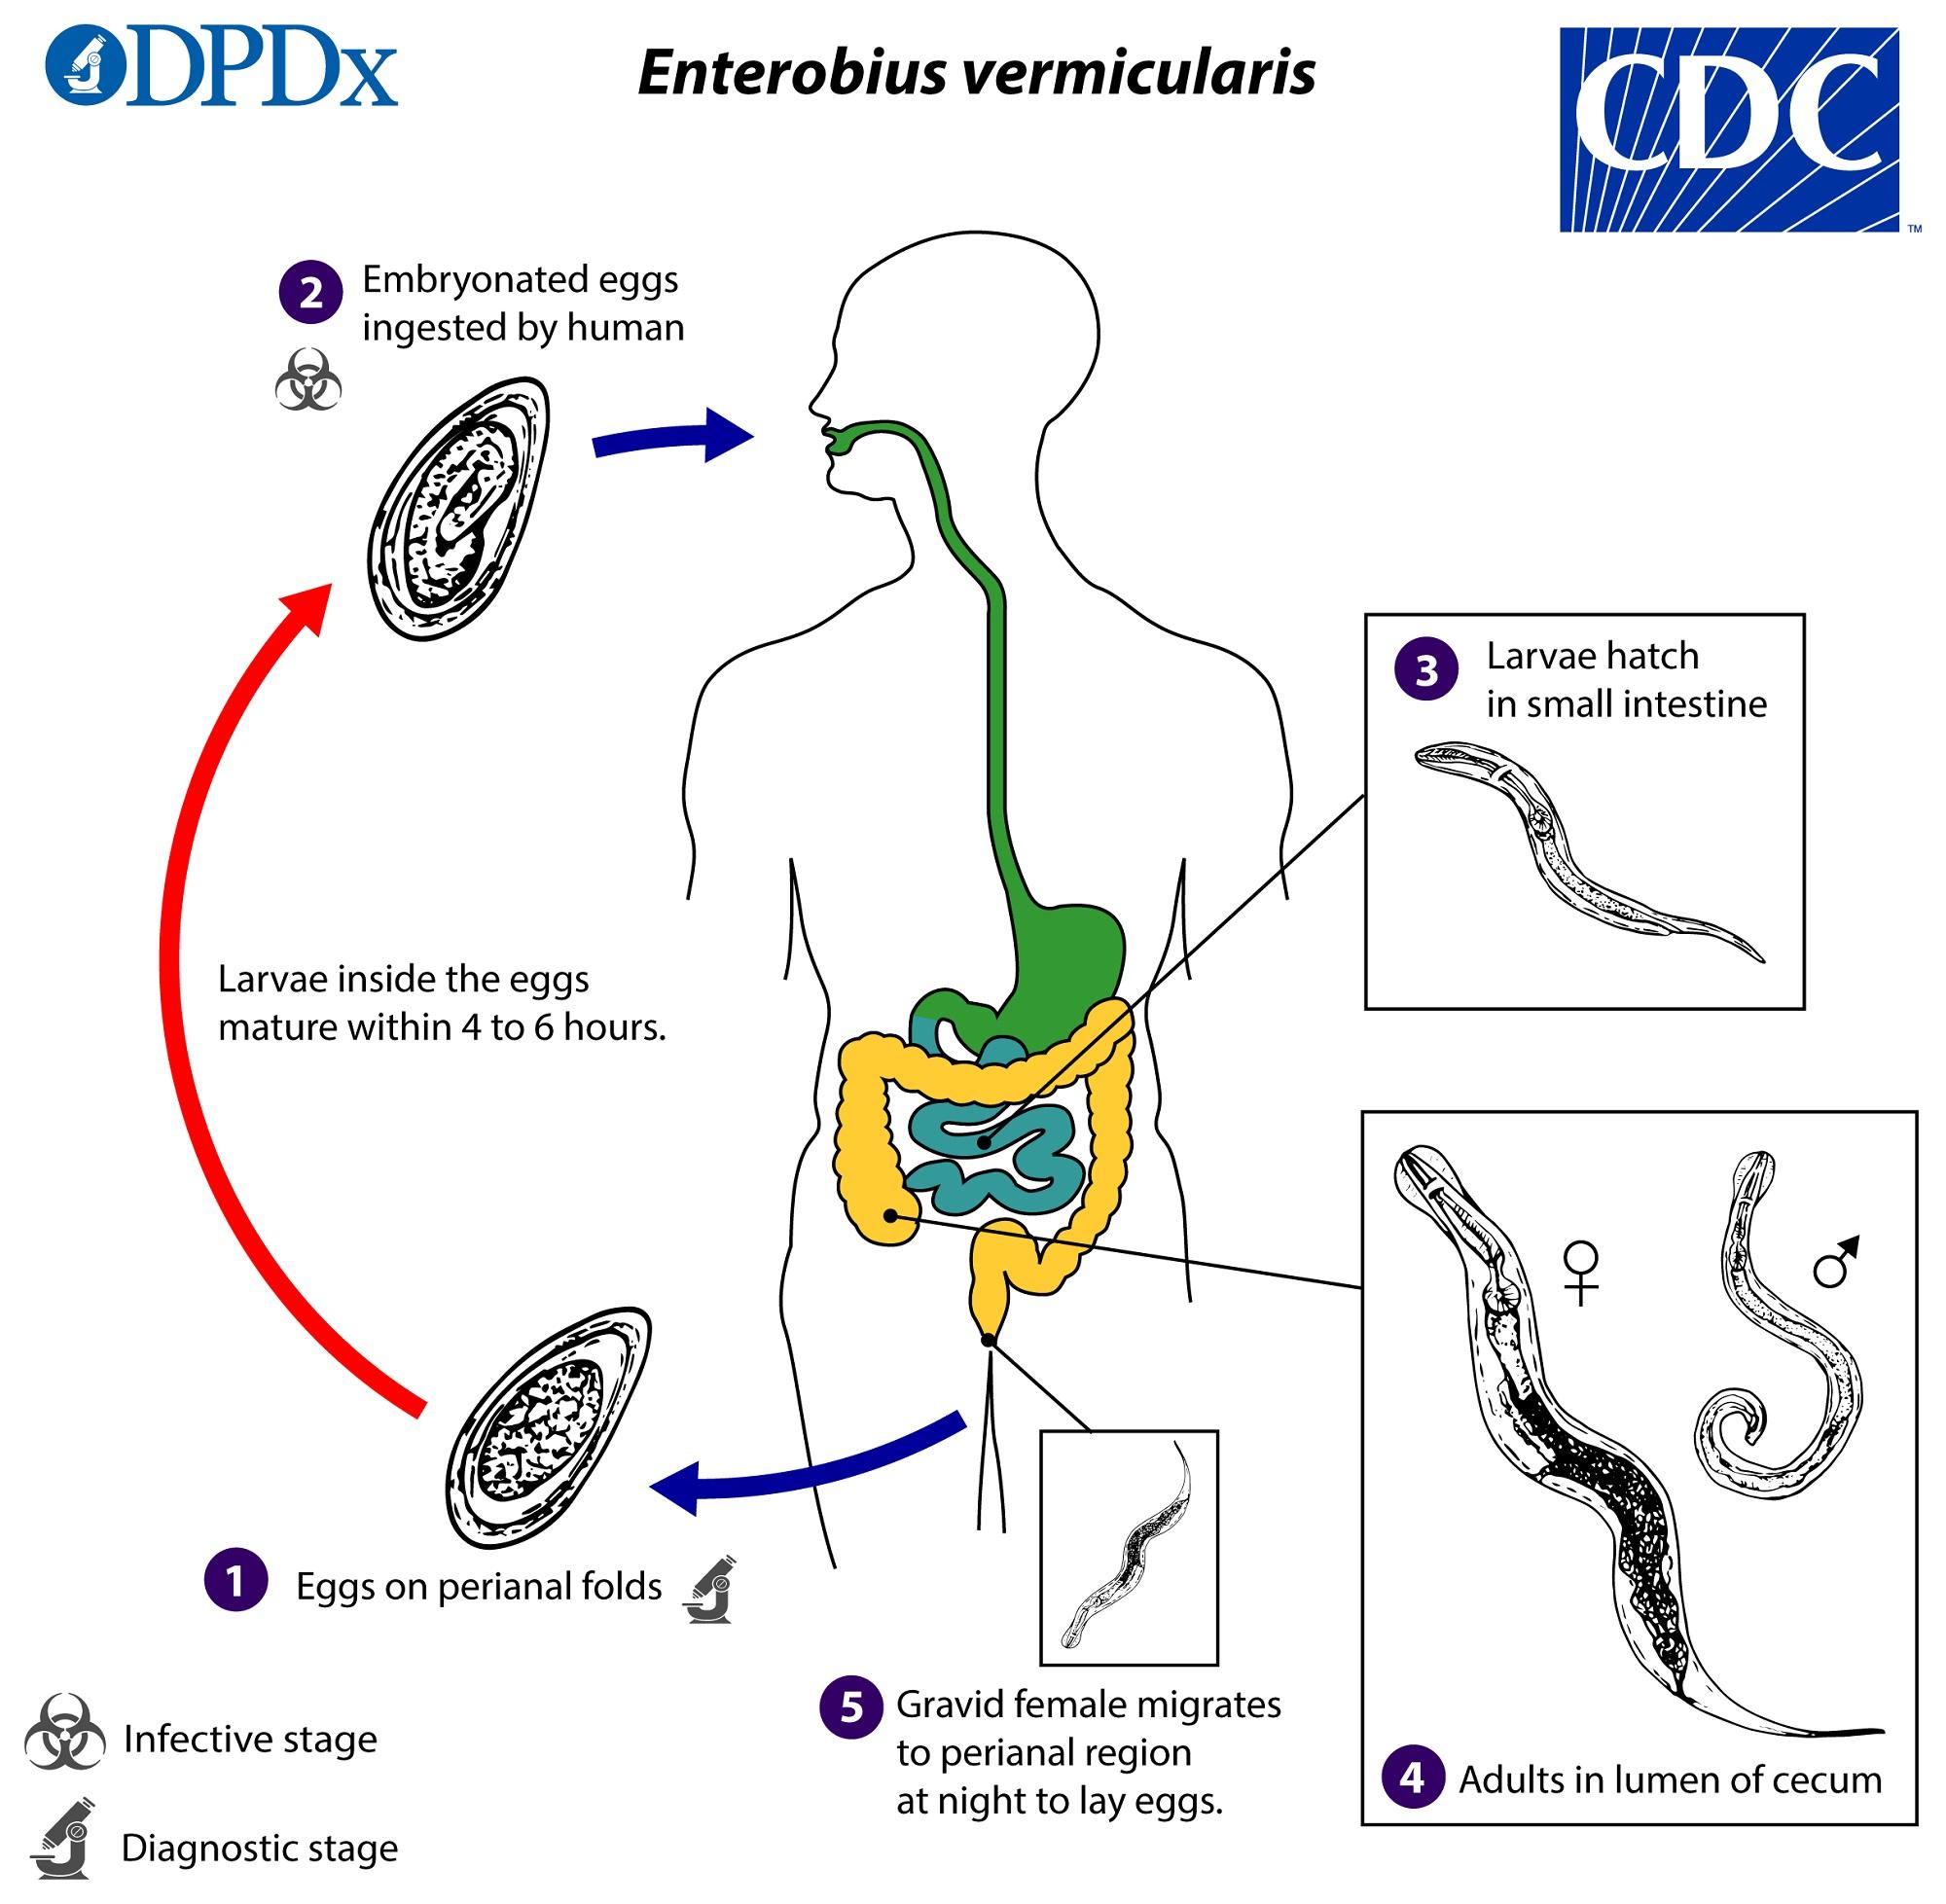 enterobius vermicularis hembra y macho papilloma virus bambina